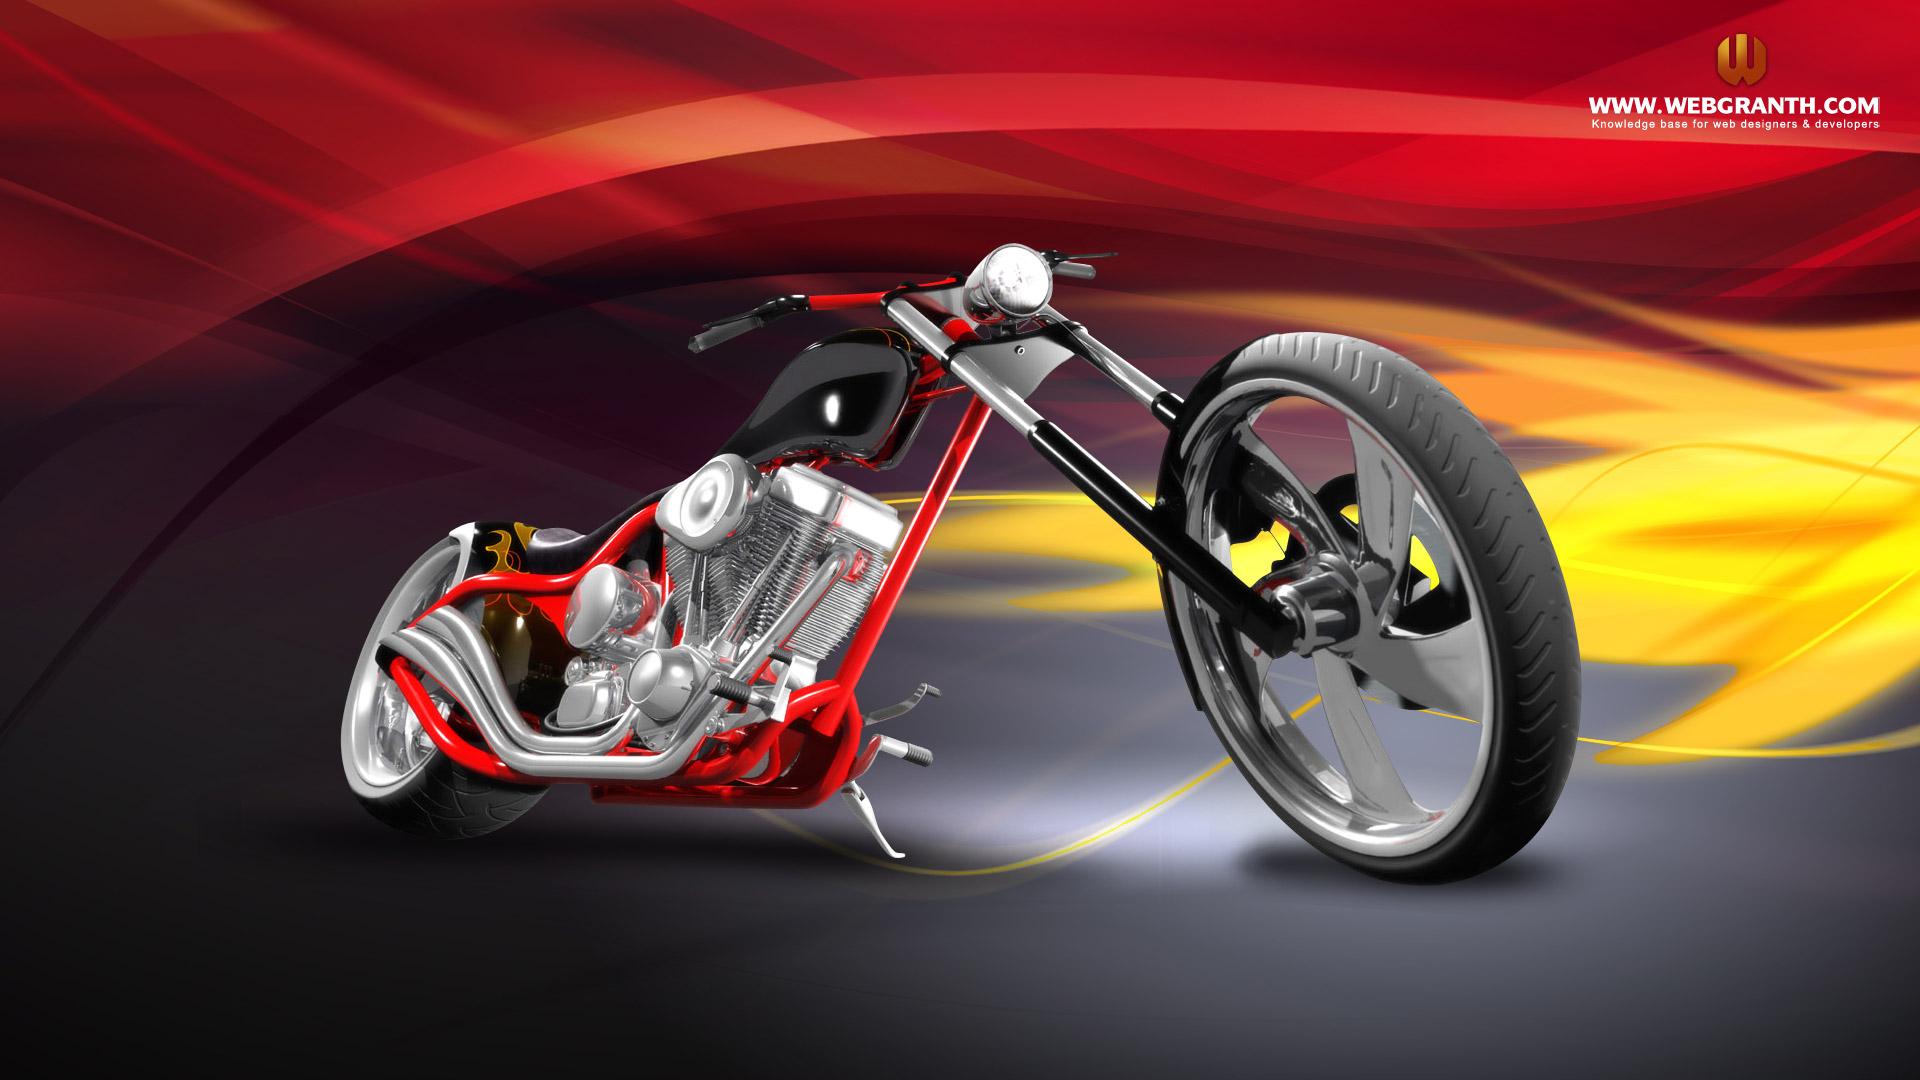 Wallpaper download com - Wallpaper Download Com Hd Chopper Bike Wallpaper Download